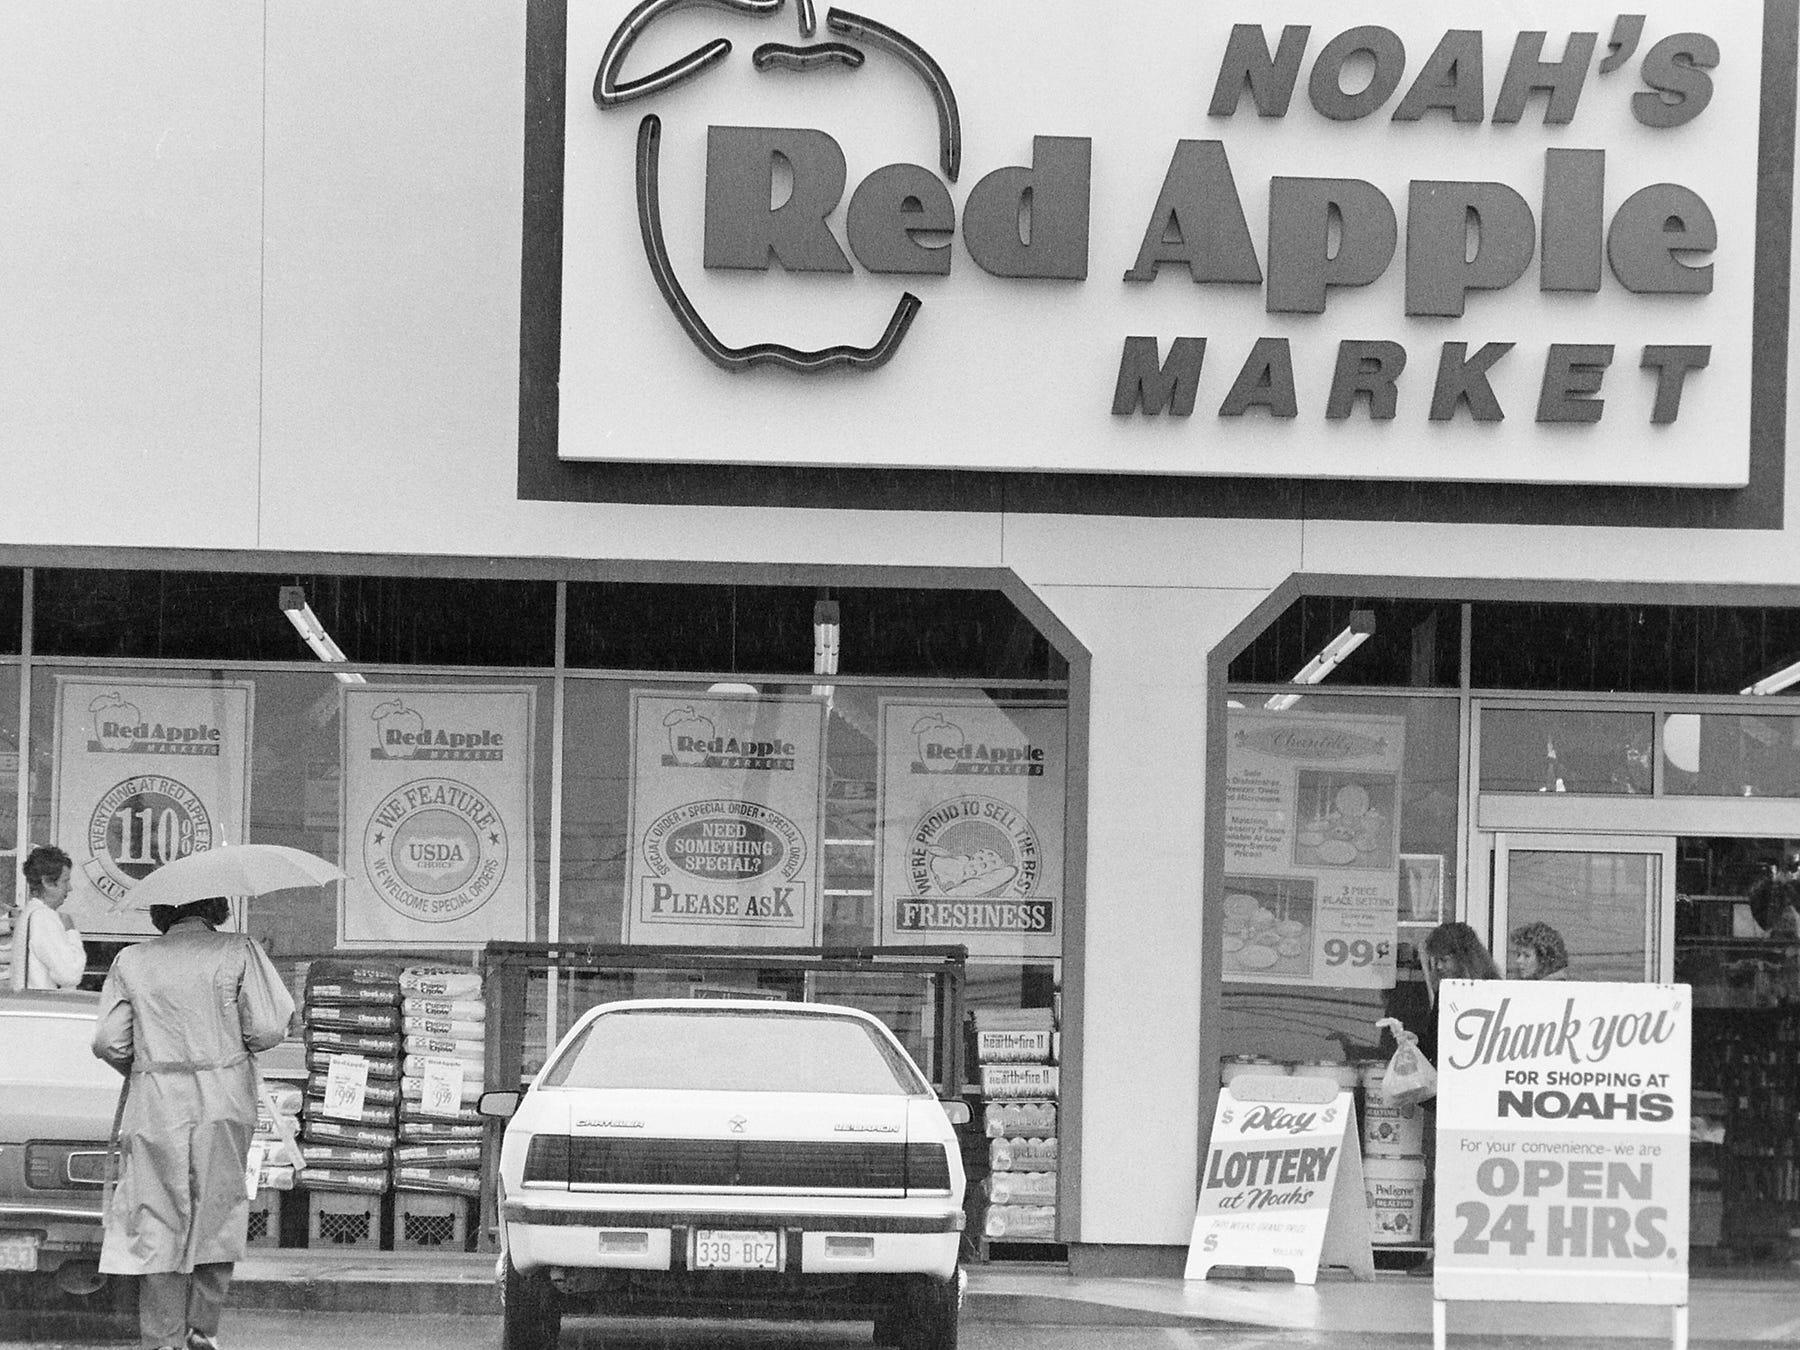 03/06/90Noah's Red Apple